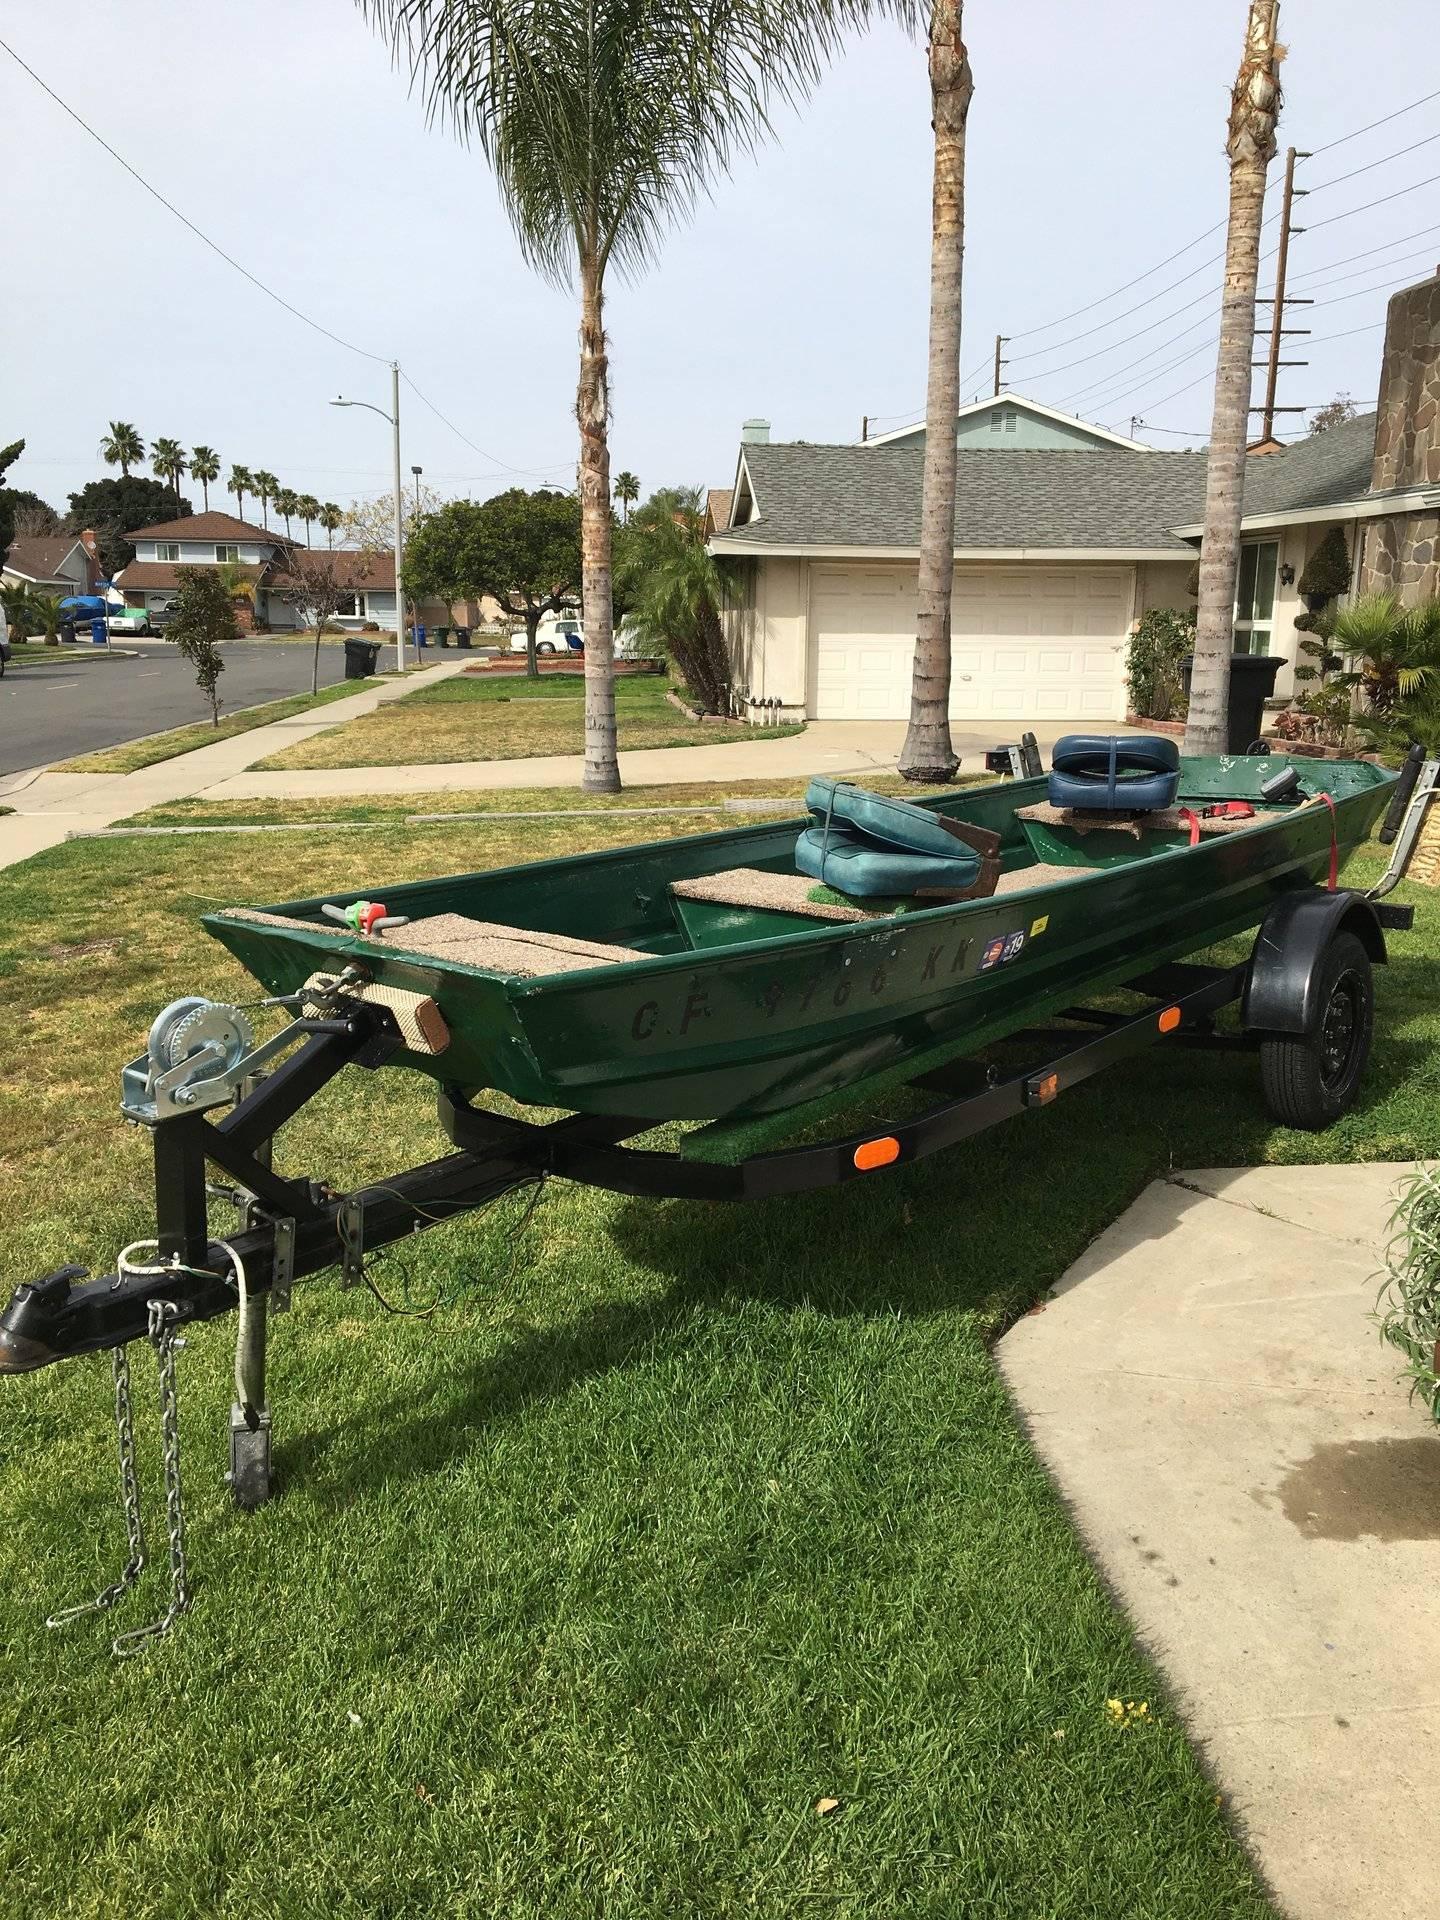 For Sale - 14 foot Aluminum Jon Boat (San Diego)   Bloodydecks